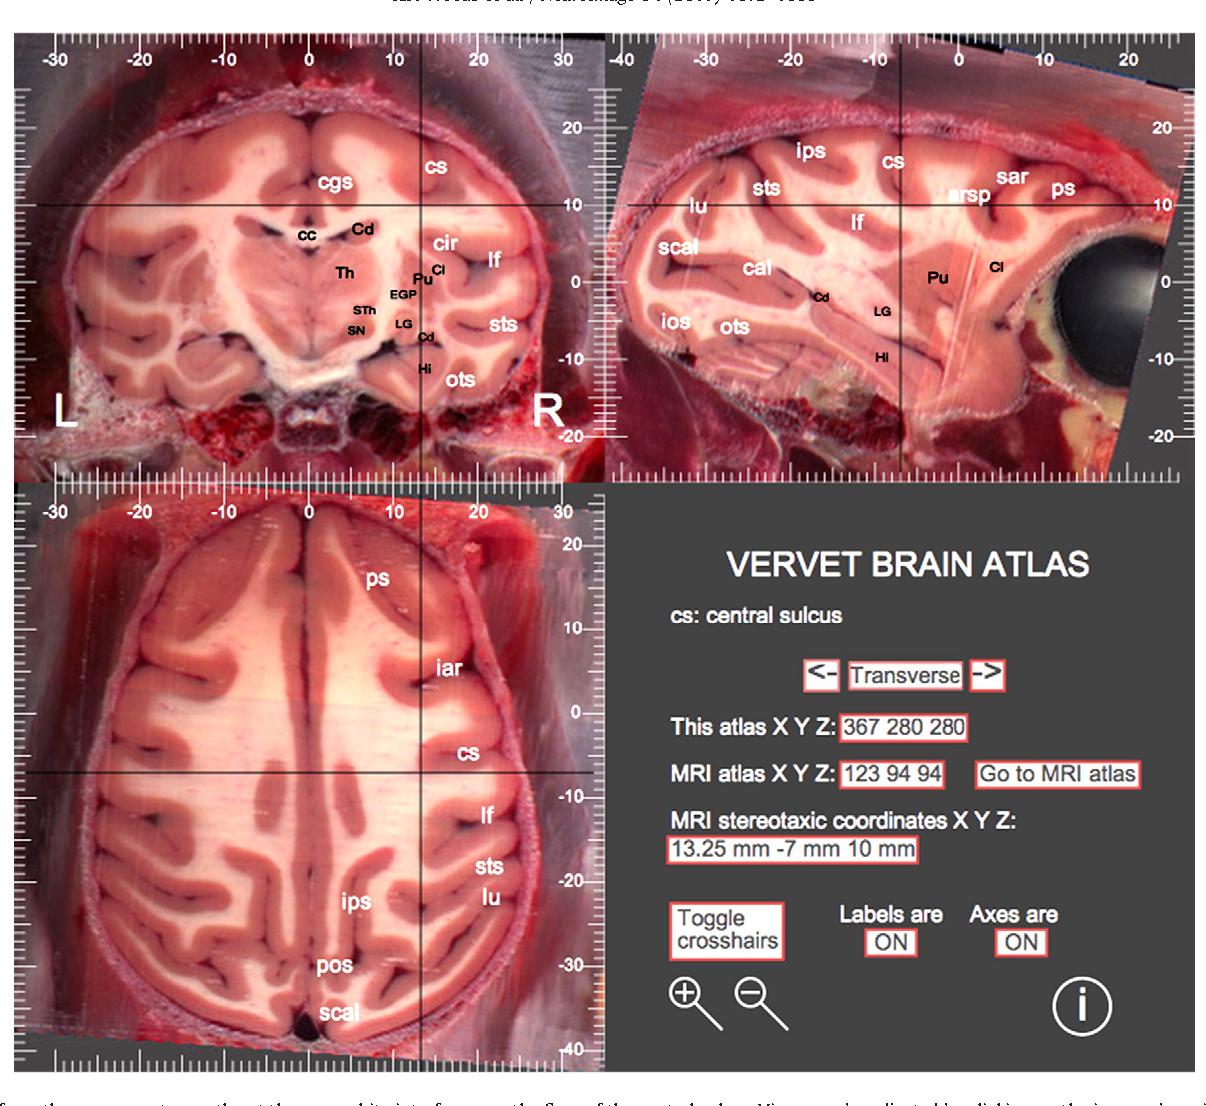 A web-based brain atlas of the vervet monkey, Chlorocebus aethiops ...